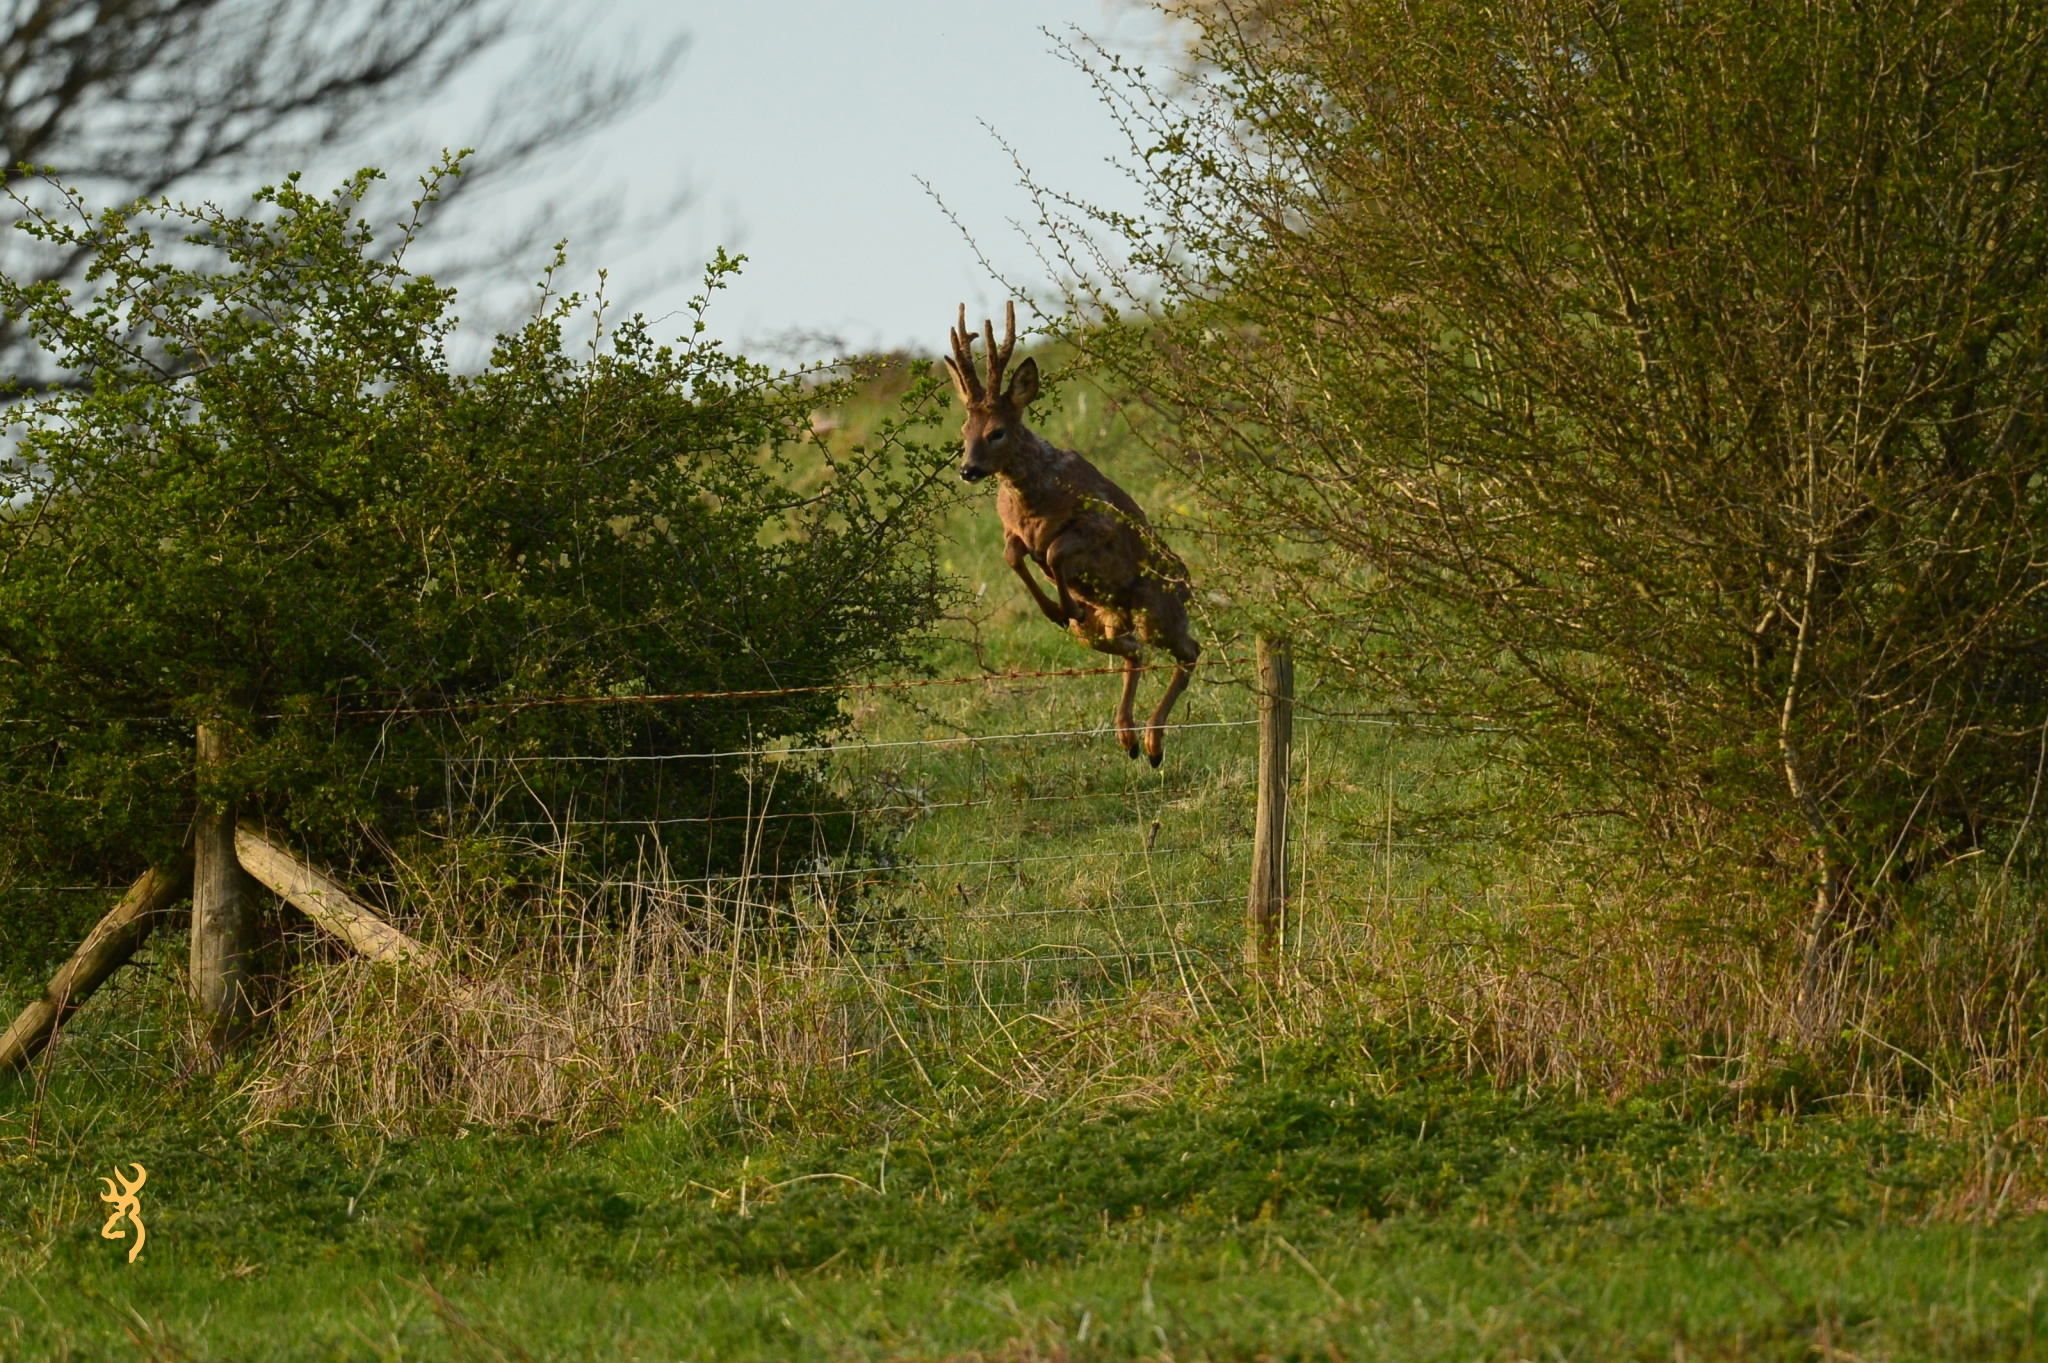 Bucks oncoming!